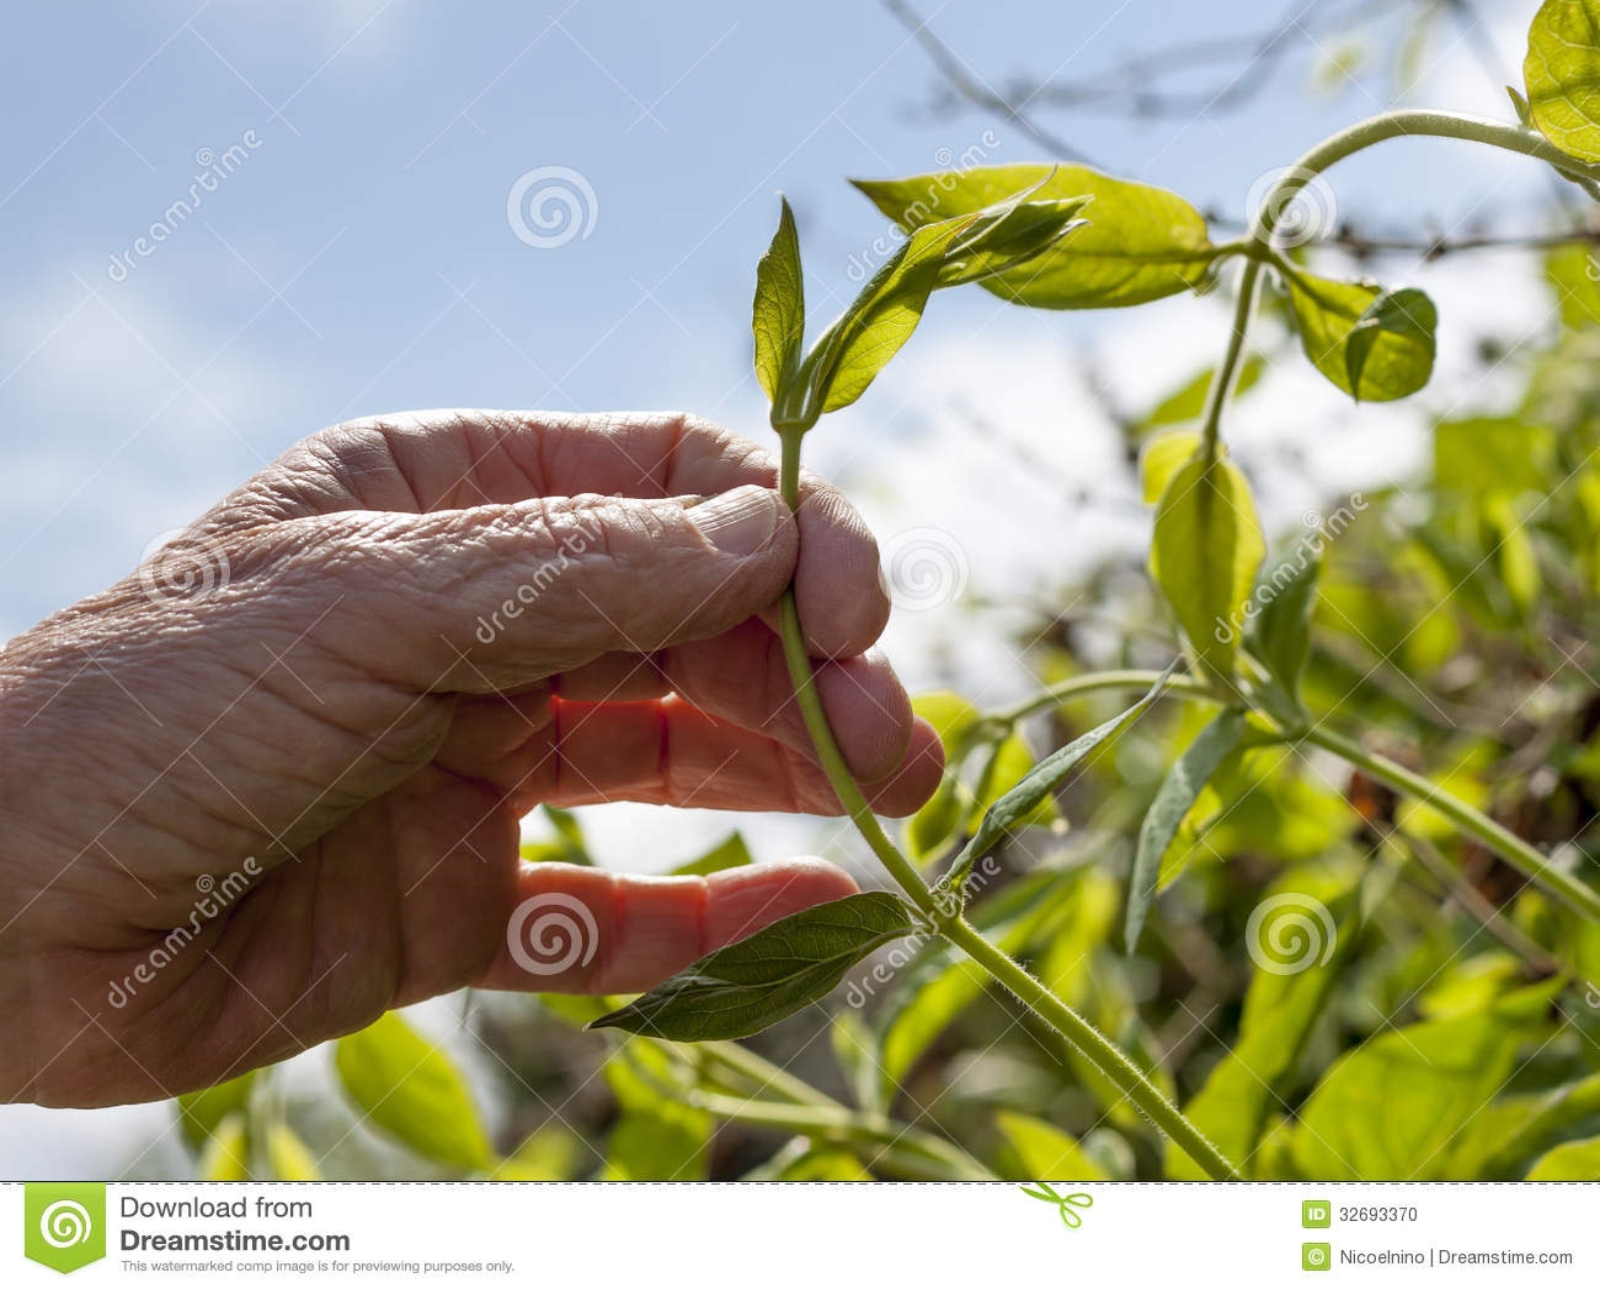 Gardeners hand holding a creeping plant stock photo image of gardener s hand holding a creeping plant izmirmasajfo